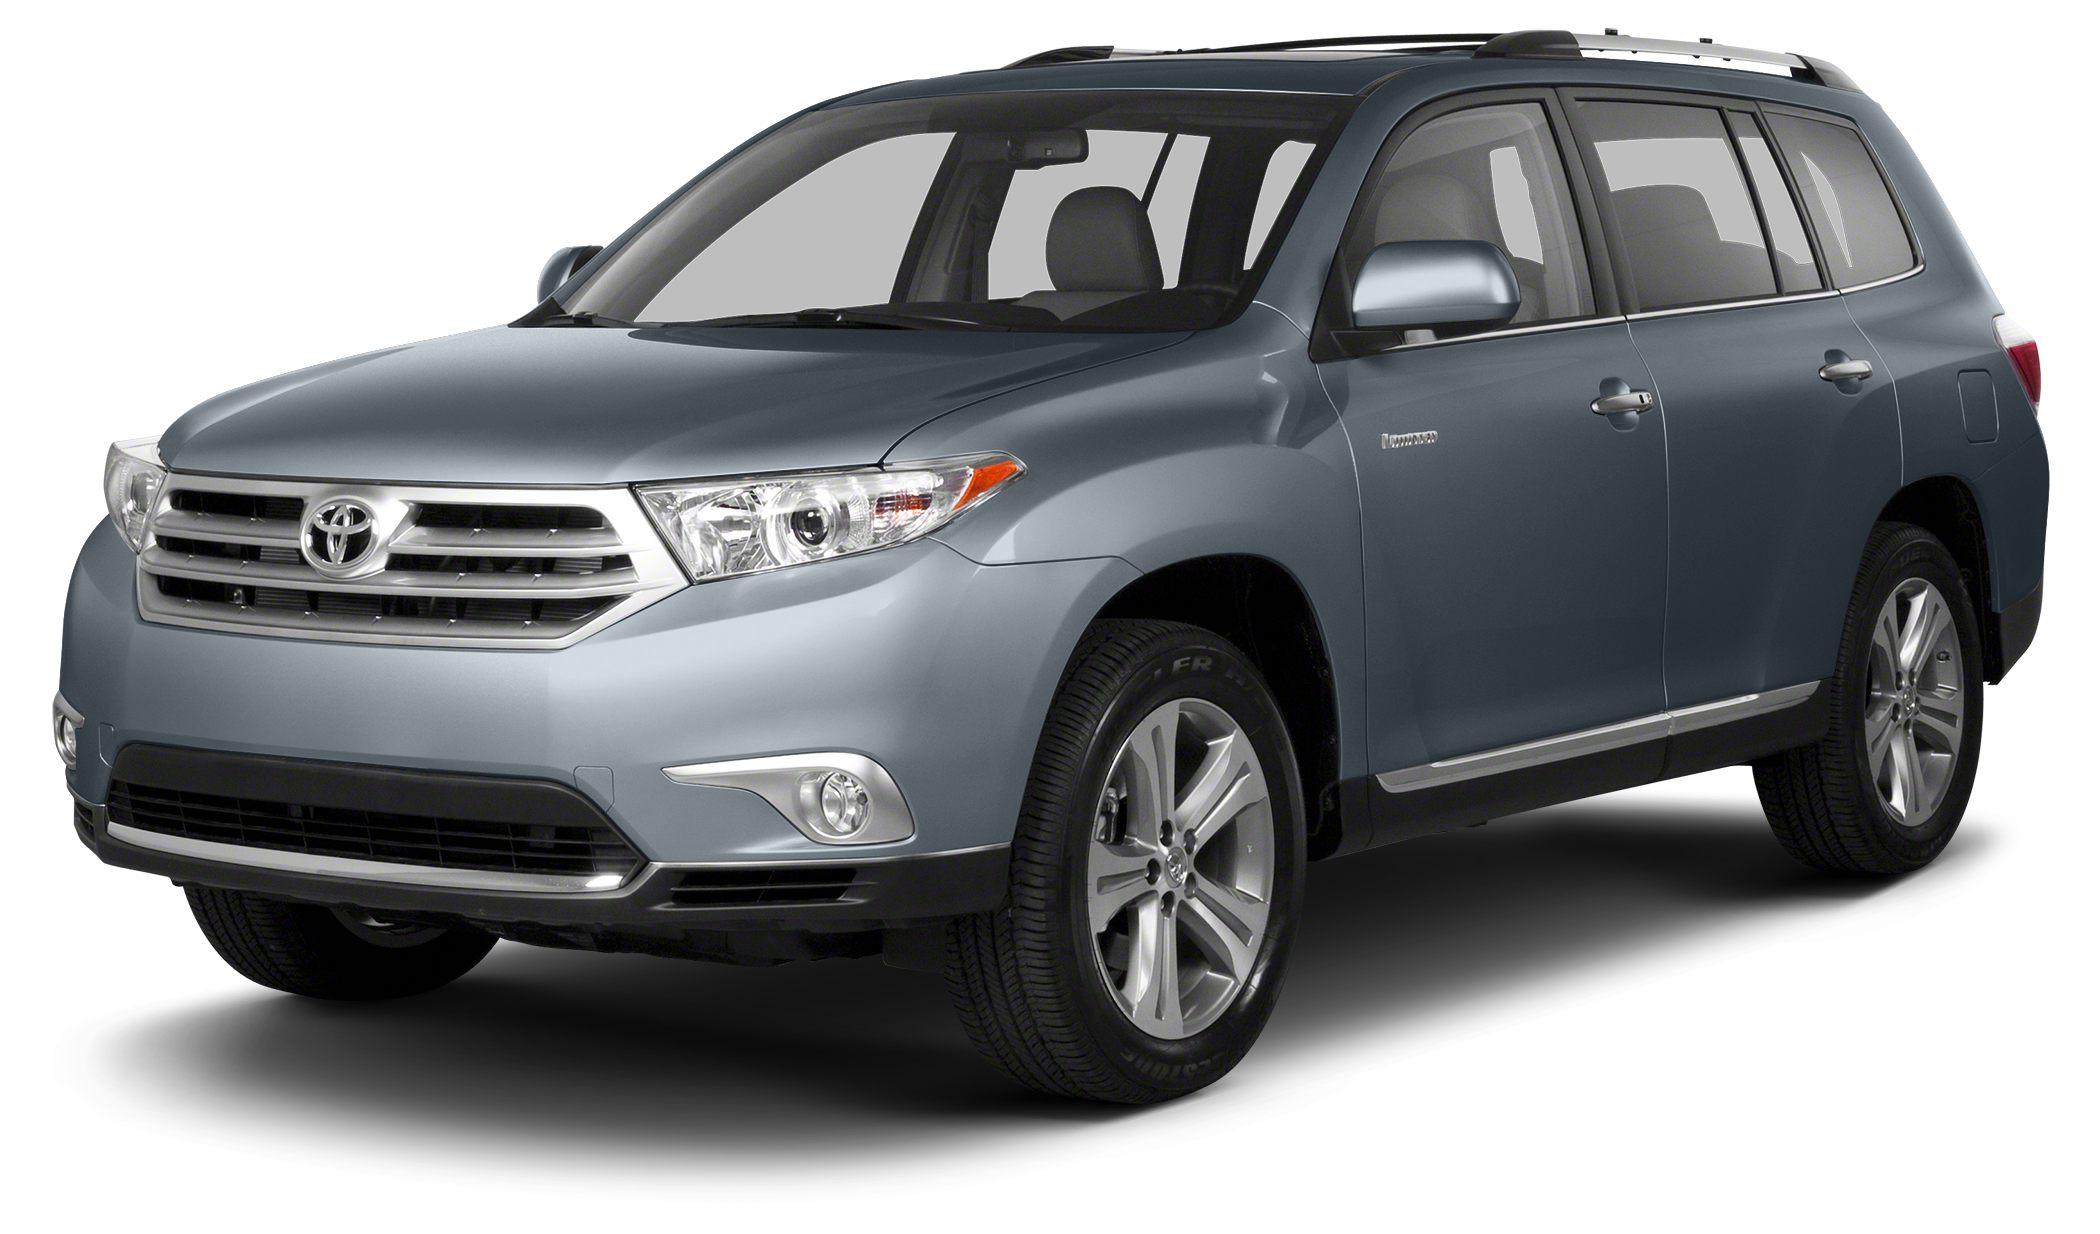 2013 Toyota Highlander Base Plus LOW MILES - 52391 Plus trim PRICE DROP FROM 21465 PRICED TO